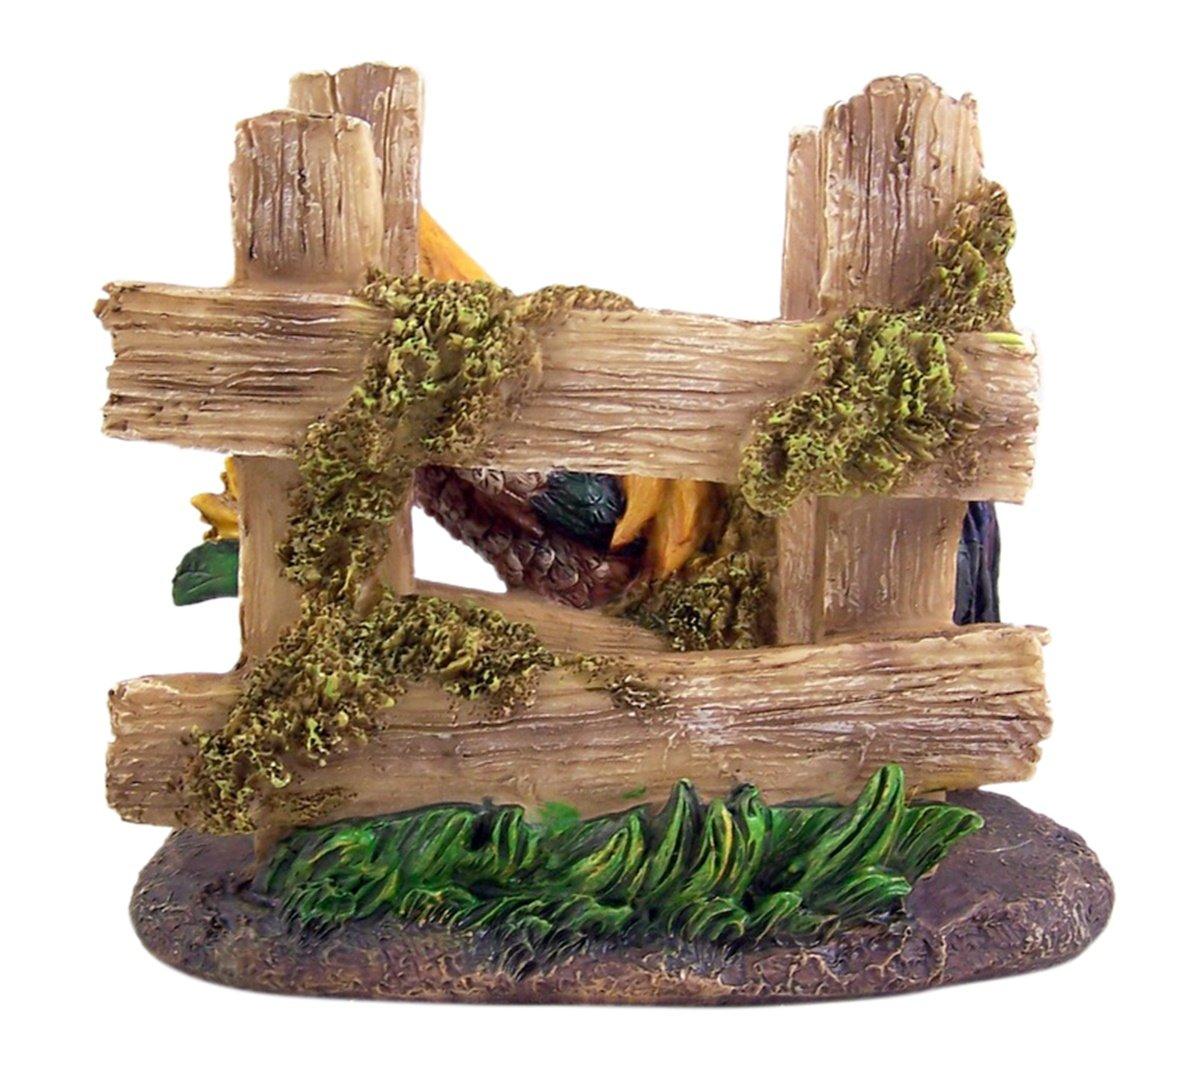 Farm Yard Rooster Napkin Holder 5 1/4 Inch by Decorative Napkin Holder (Image #2)